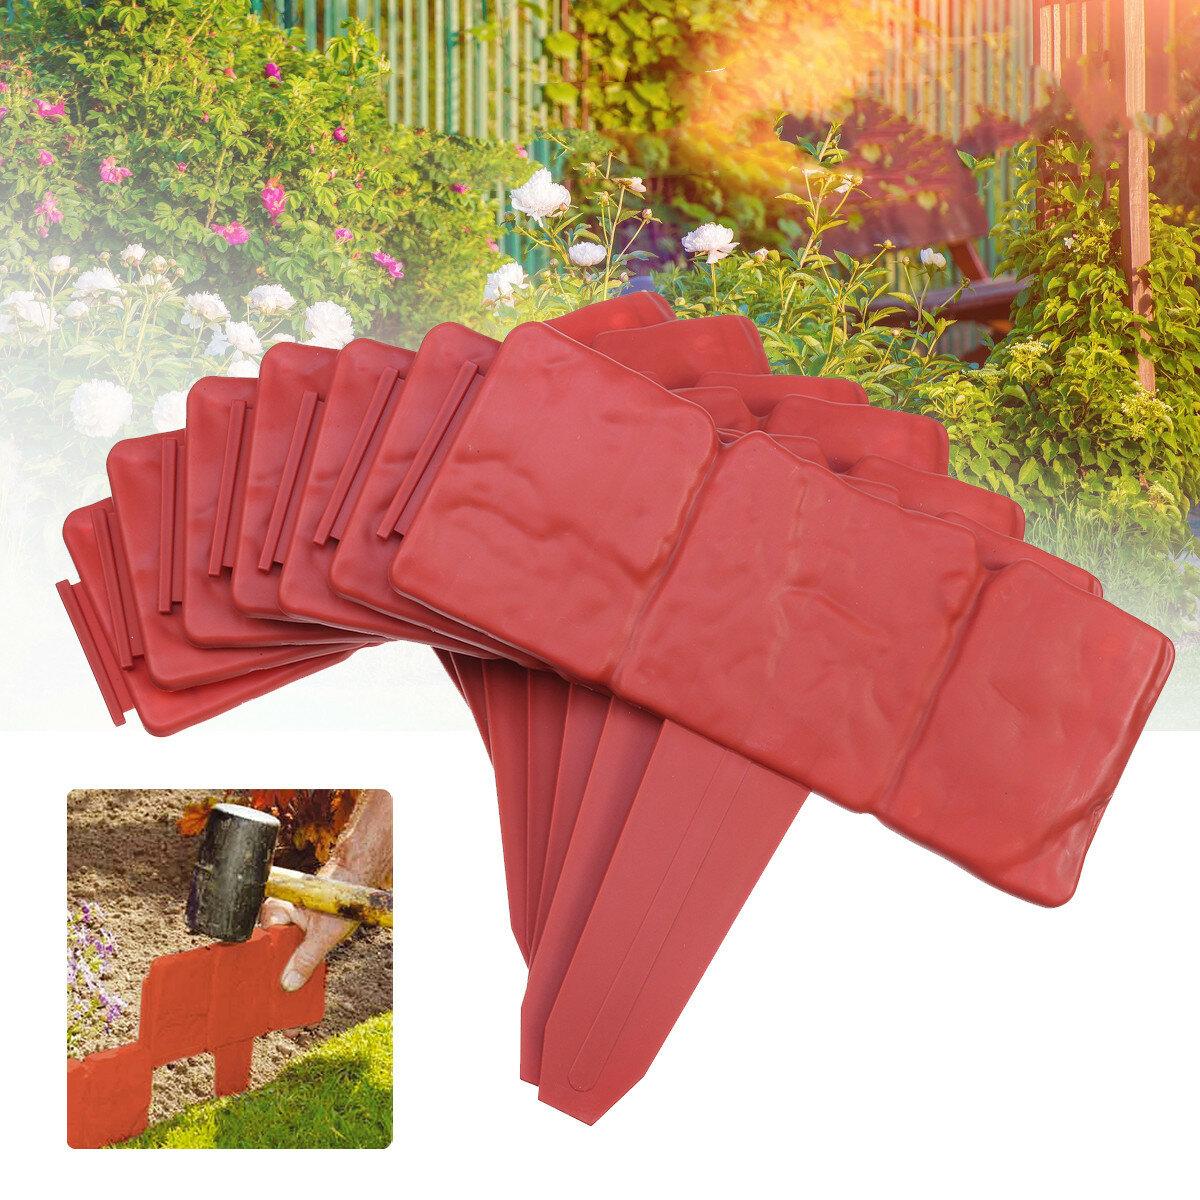 <US Instock>20 Pcs/set Red Garden Fence Plastic Cobbled Stone Effect Garden Border Edging Plant Border Flowerbed Lawn Decor